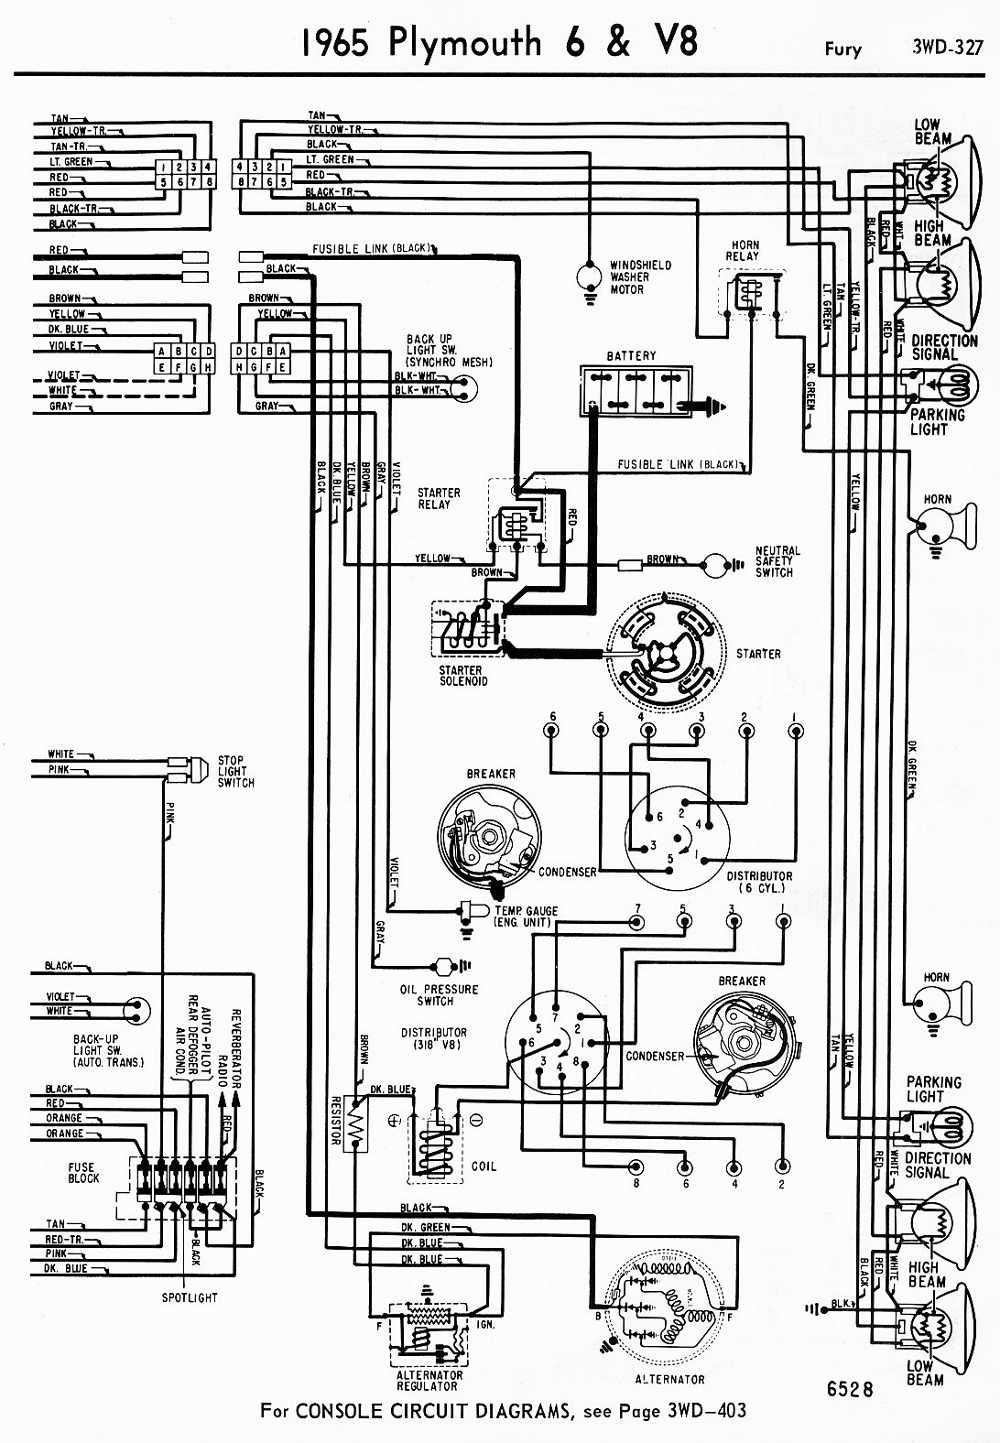 1967 plymouth fury wiring diagram